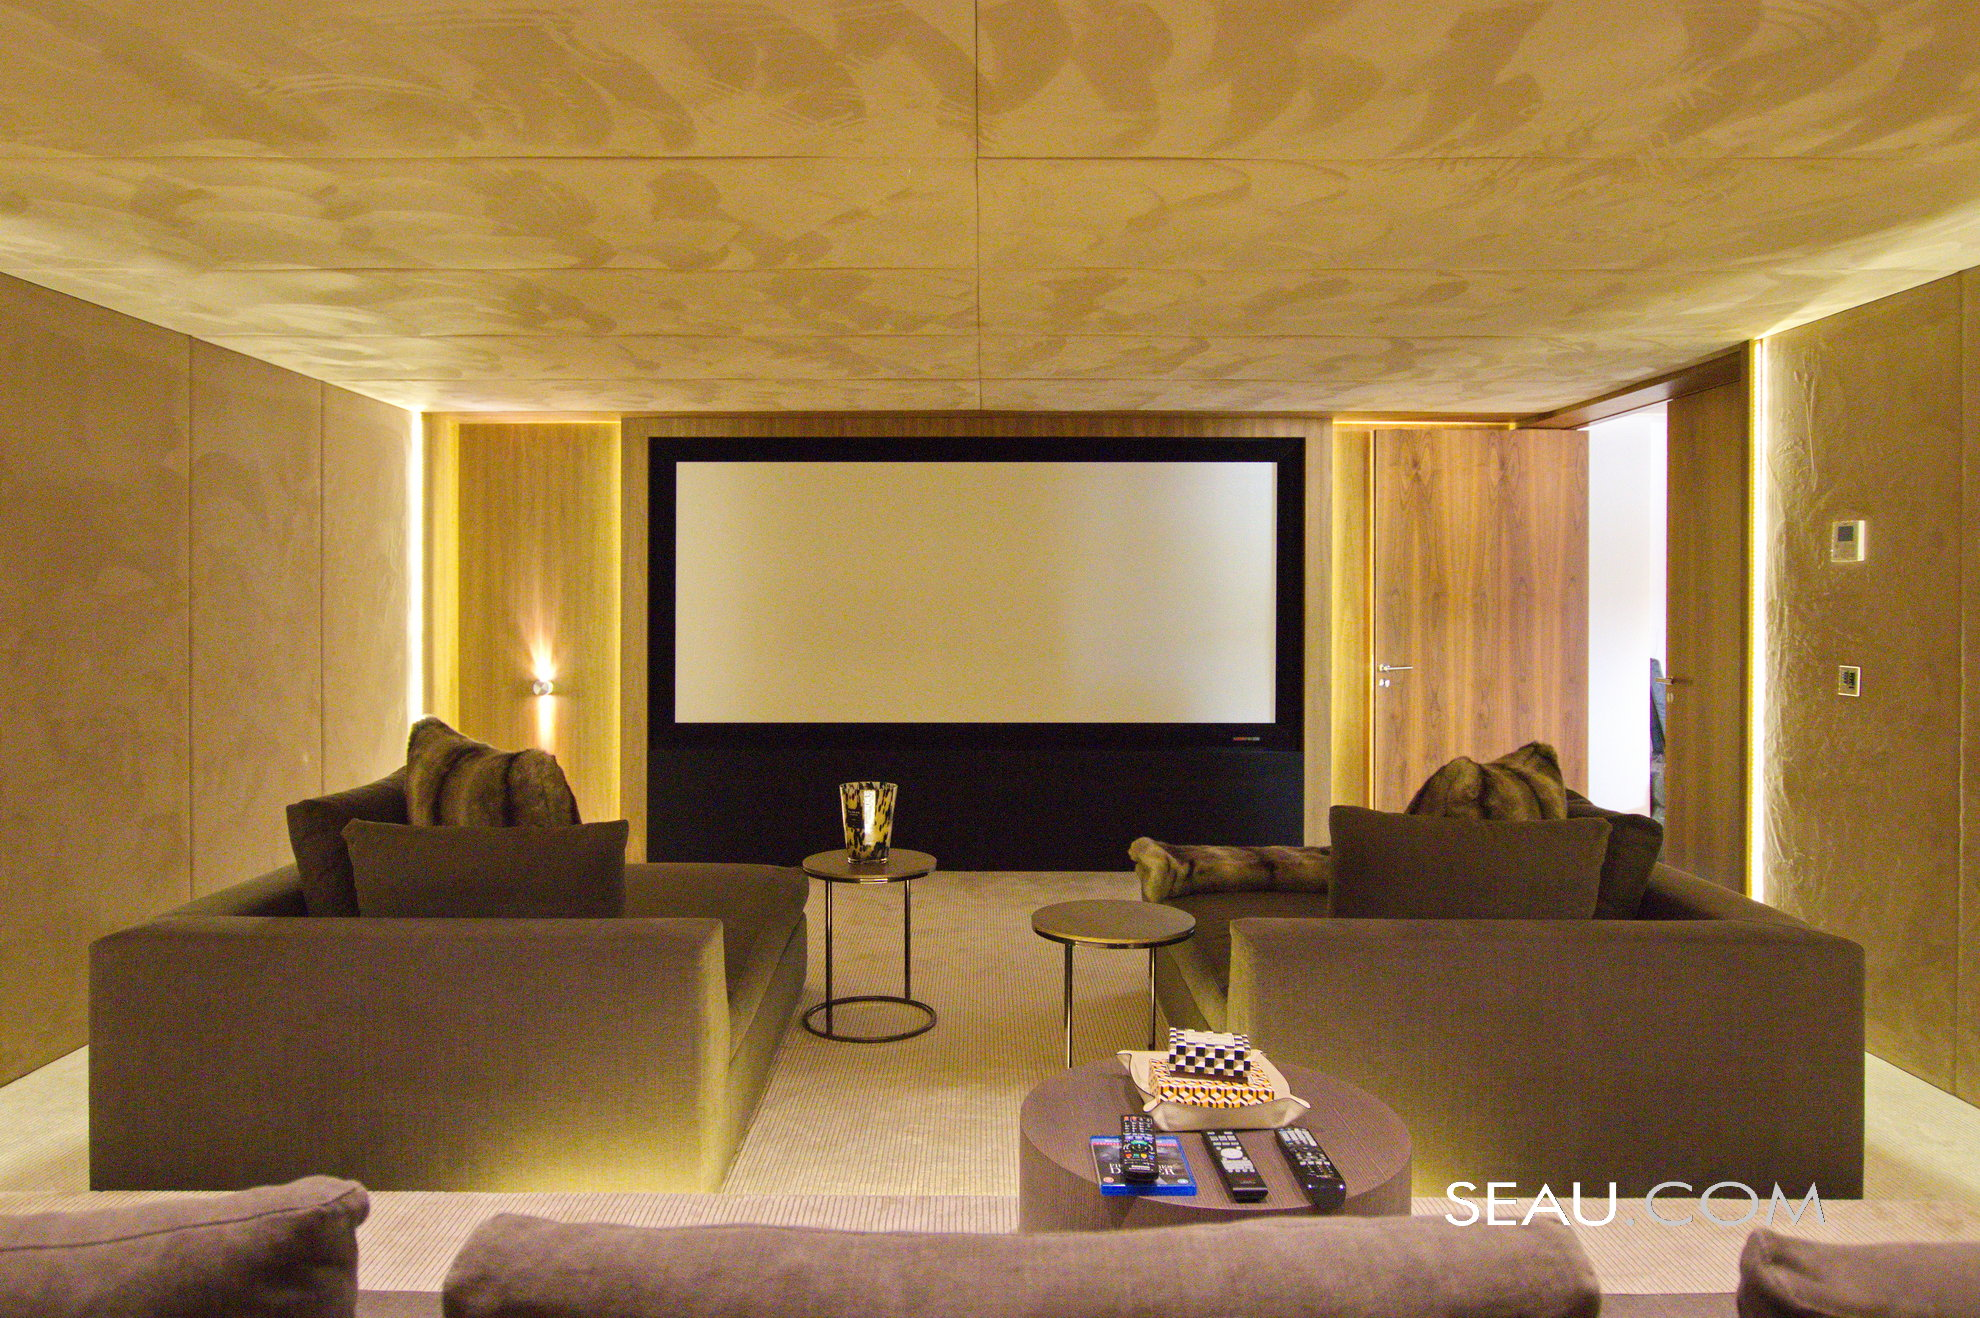 State of the art cinema room